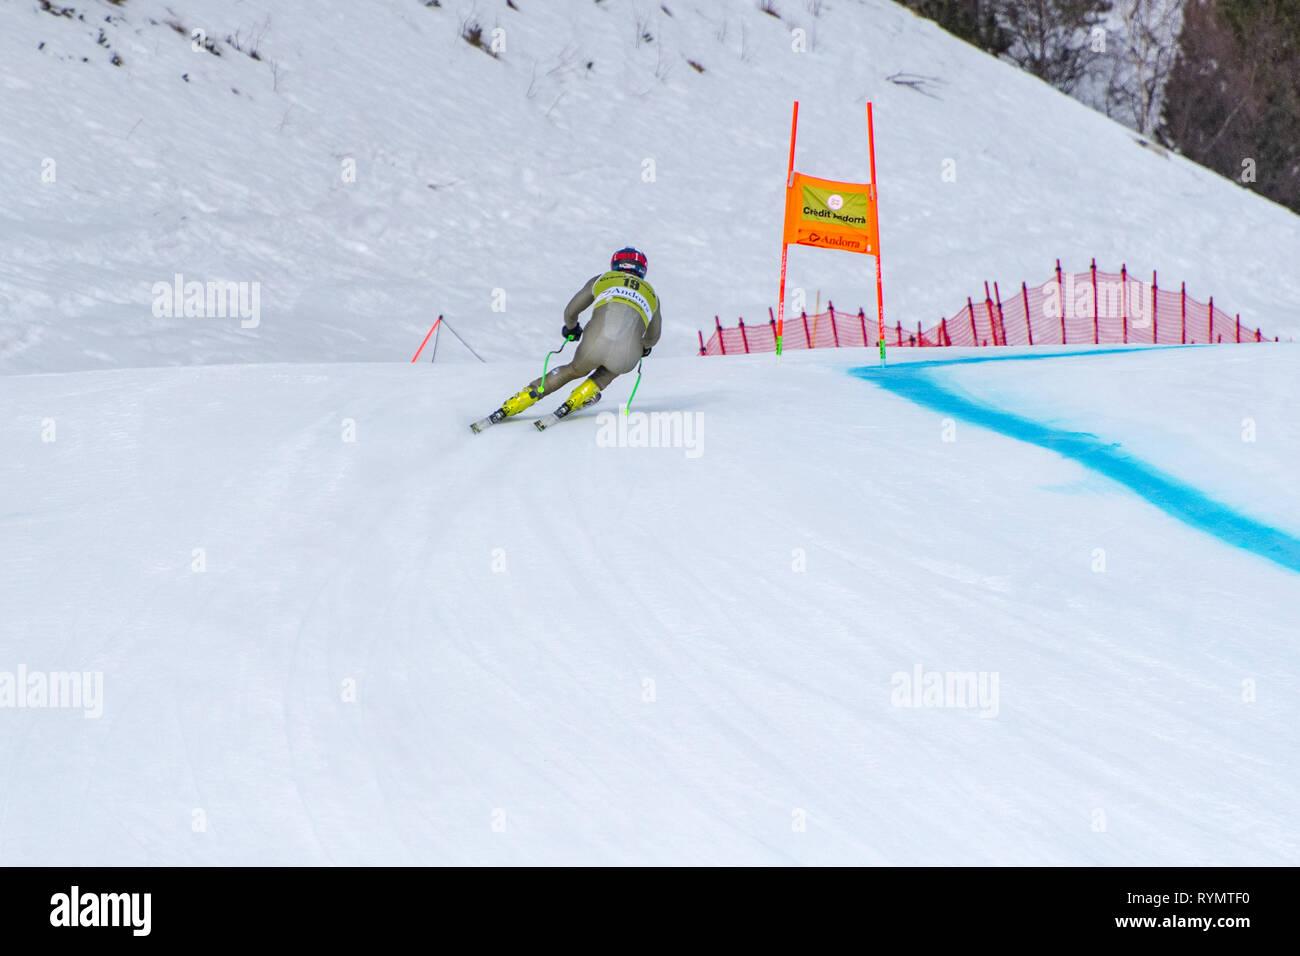 Matthias Mayer AUT  takes part in the PRUEBA run for the SKI WORLD FINALS DOWNHILL MEN  race of the FIS Alpine Ski World Cup Finals at Soldeu-El Tarte - Stock Image